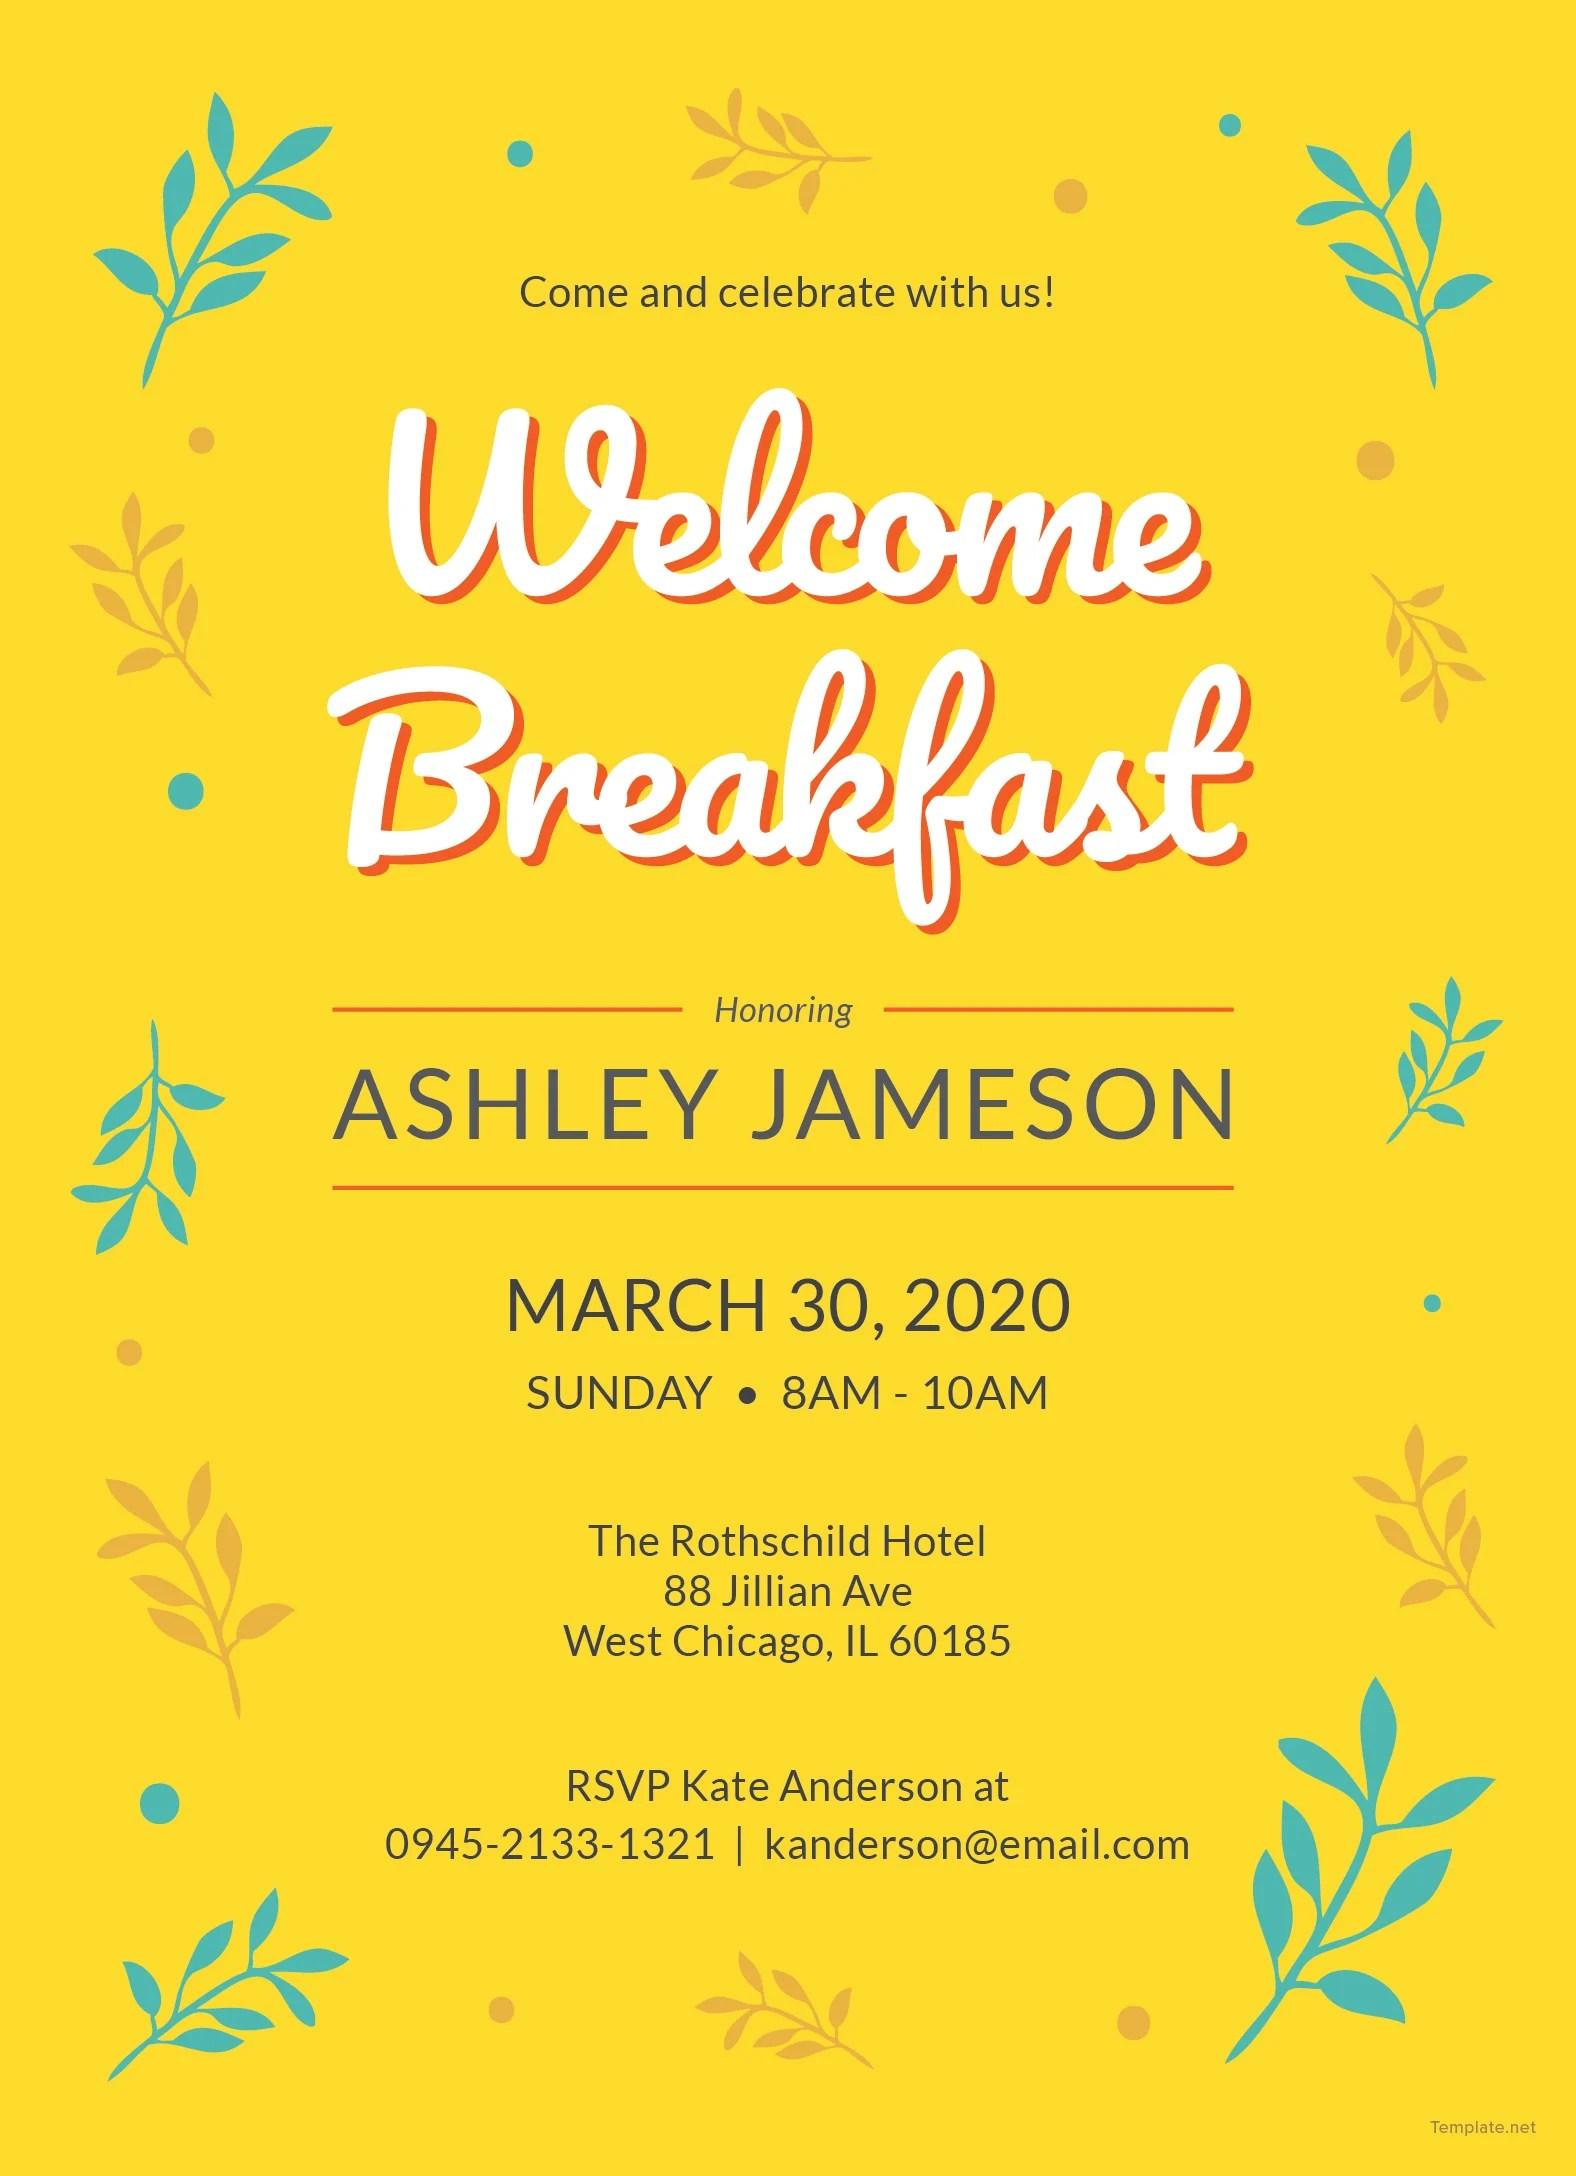 Welcome Breakfast Invitation Template In Adobe Photoshop Illustrator